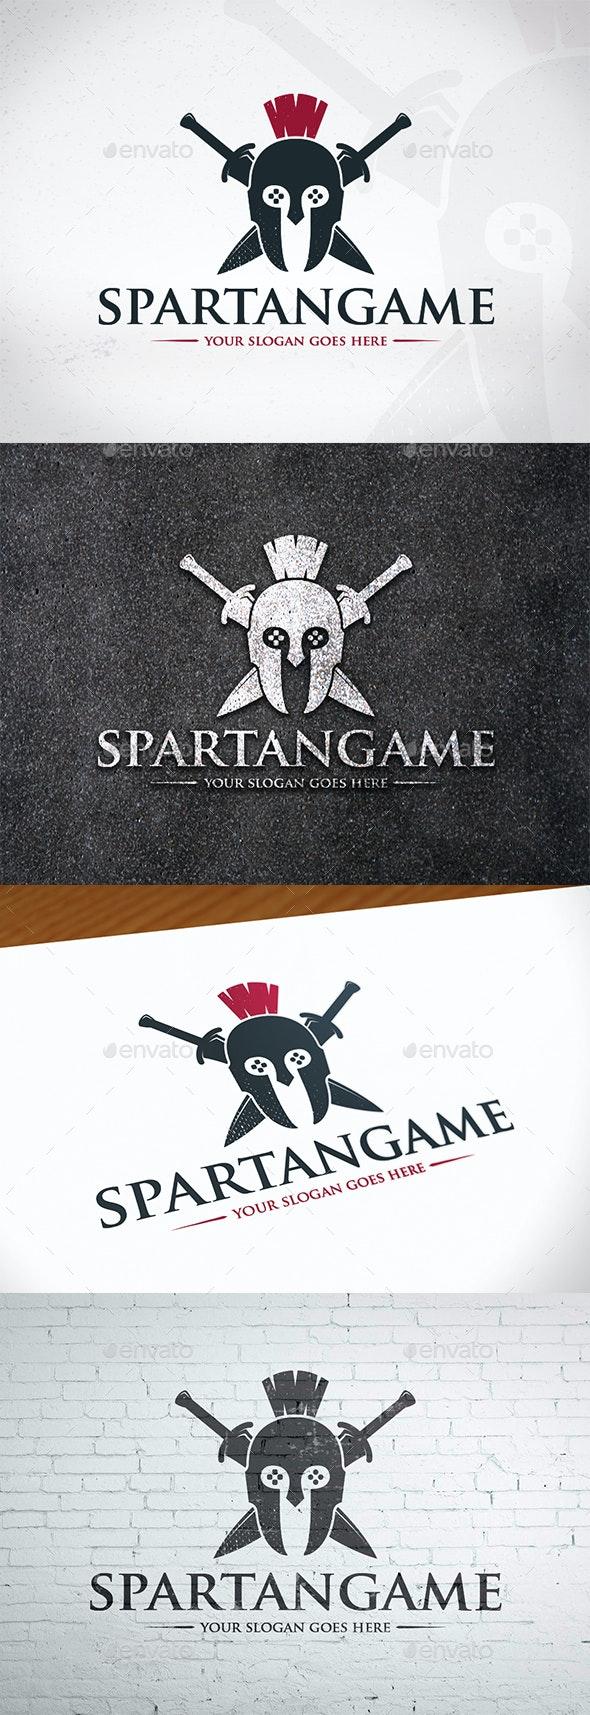 Spartan Gaming Logo Design